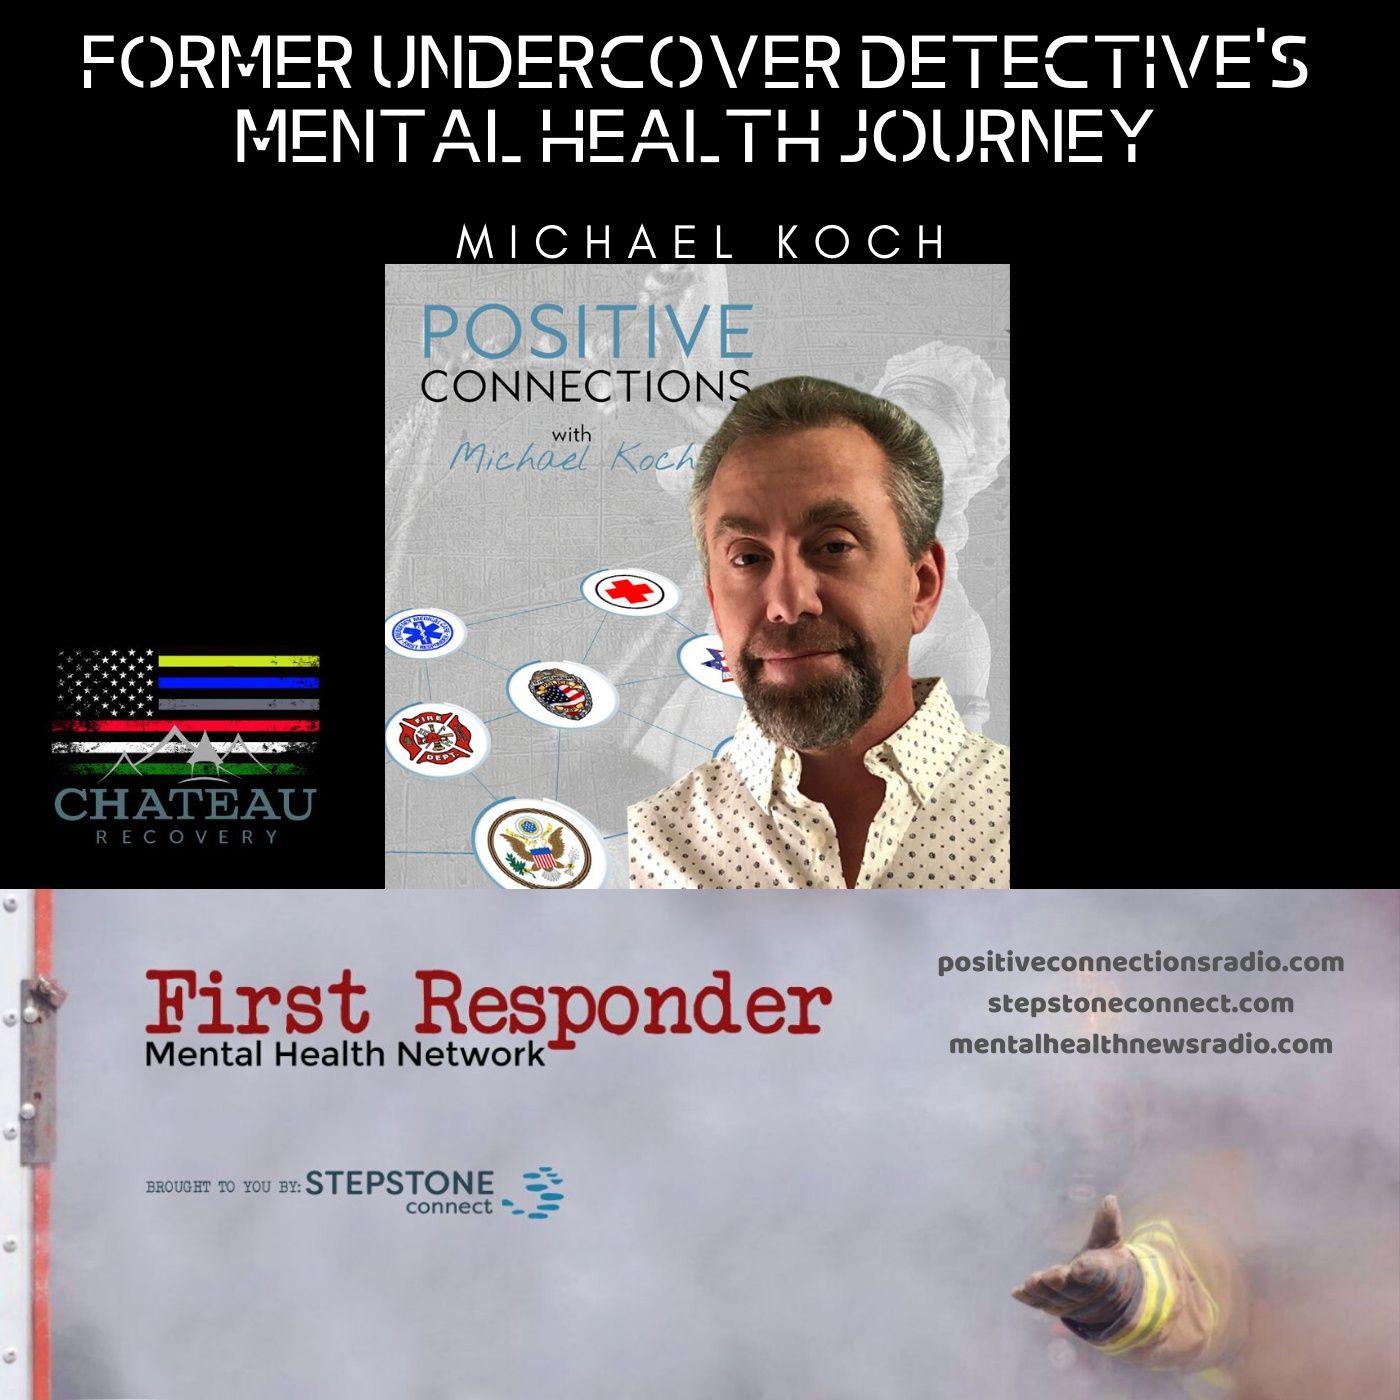 Mental Health News Radio - Former Undercover Detective's Mental Health Journey